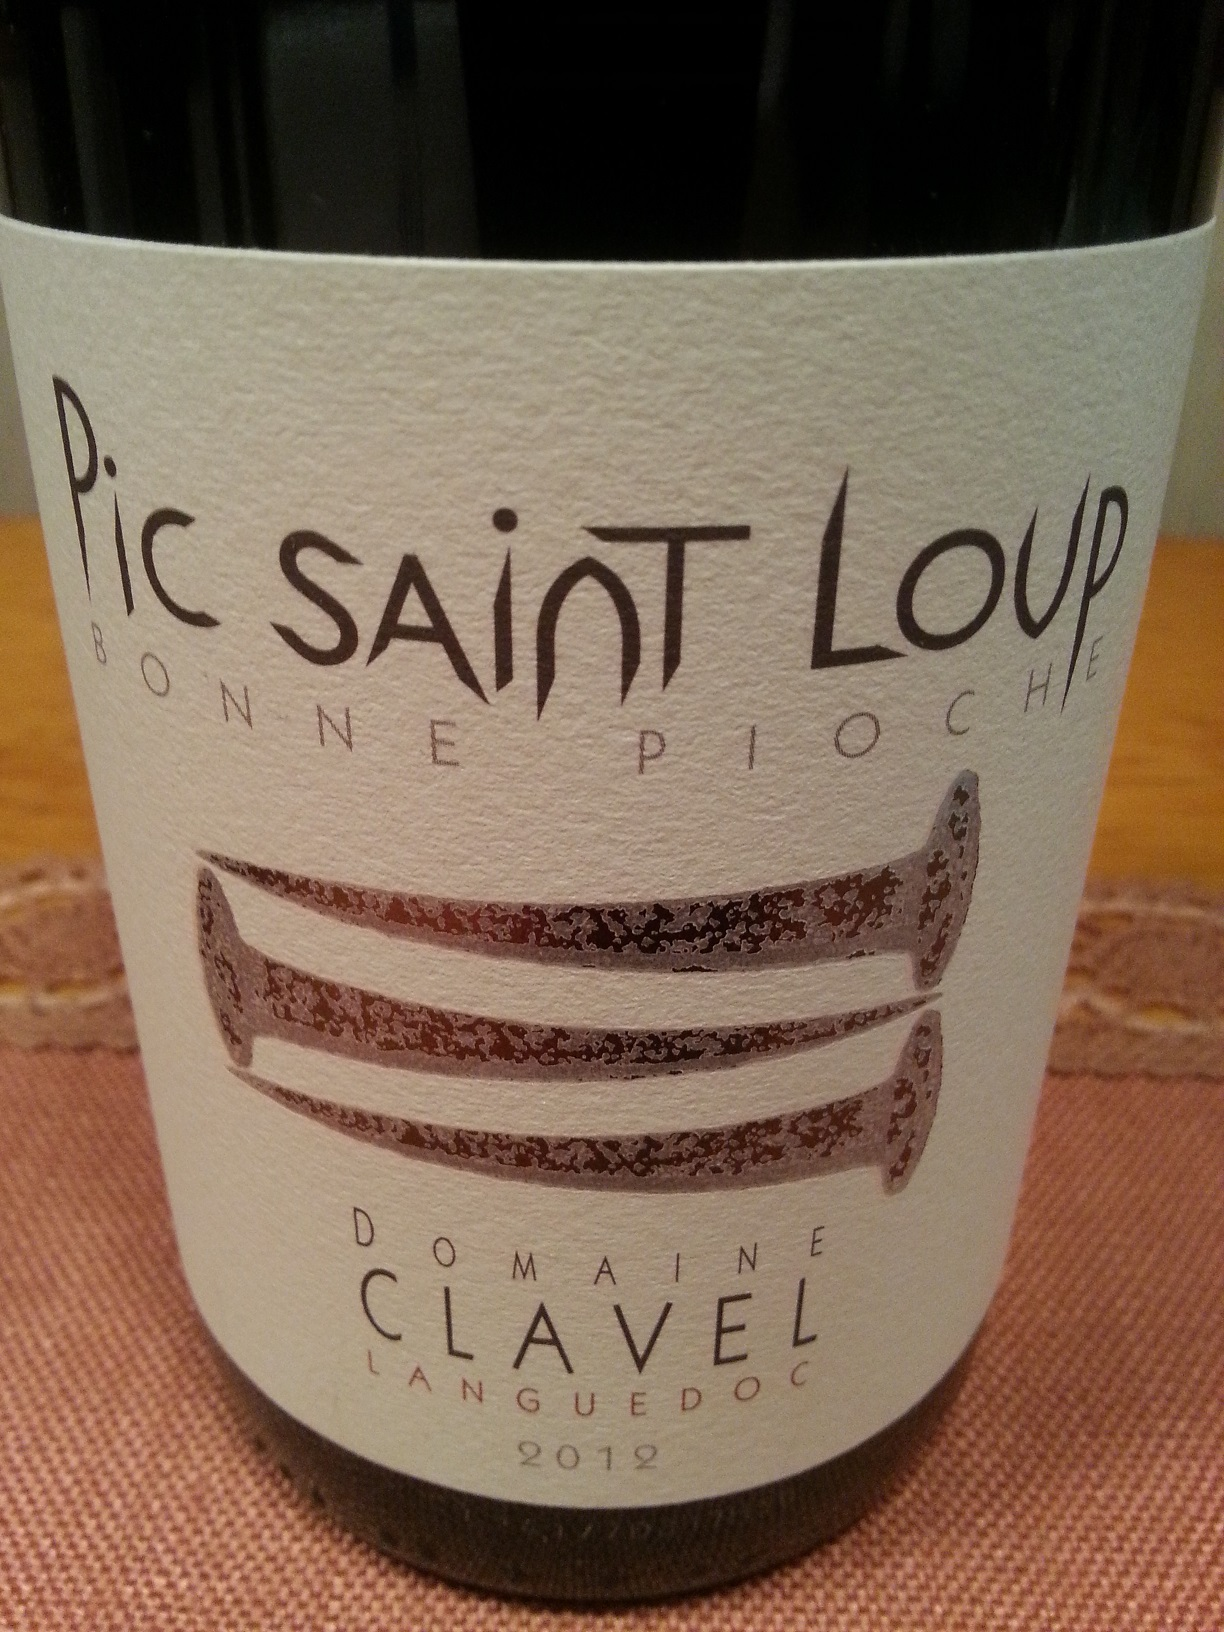 2012 Bonne Pioche Pic Saint Loup | Clavel